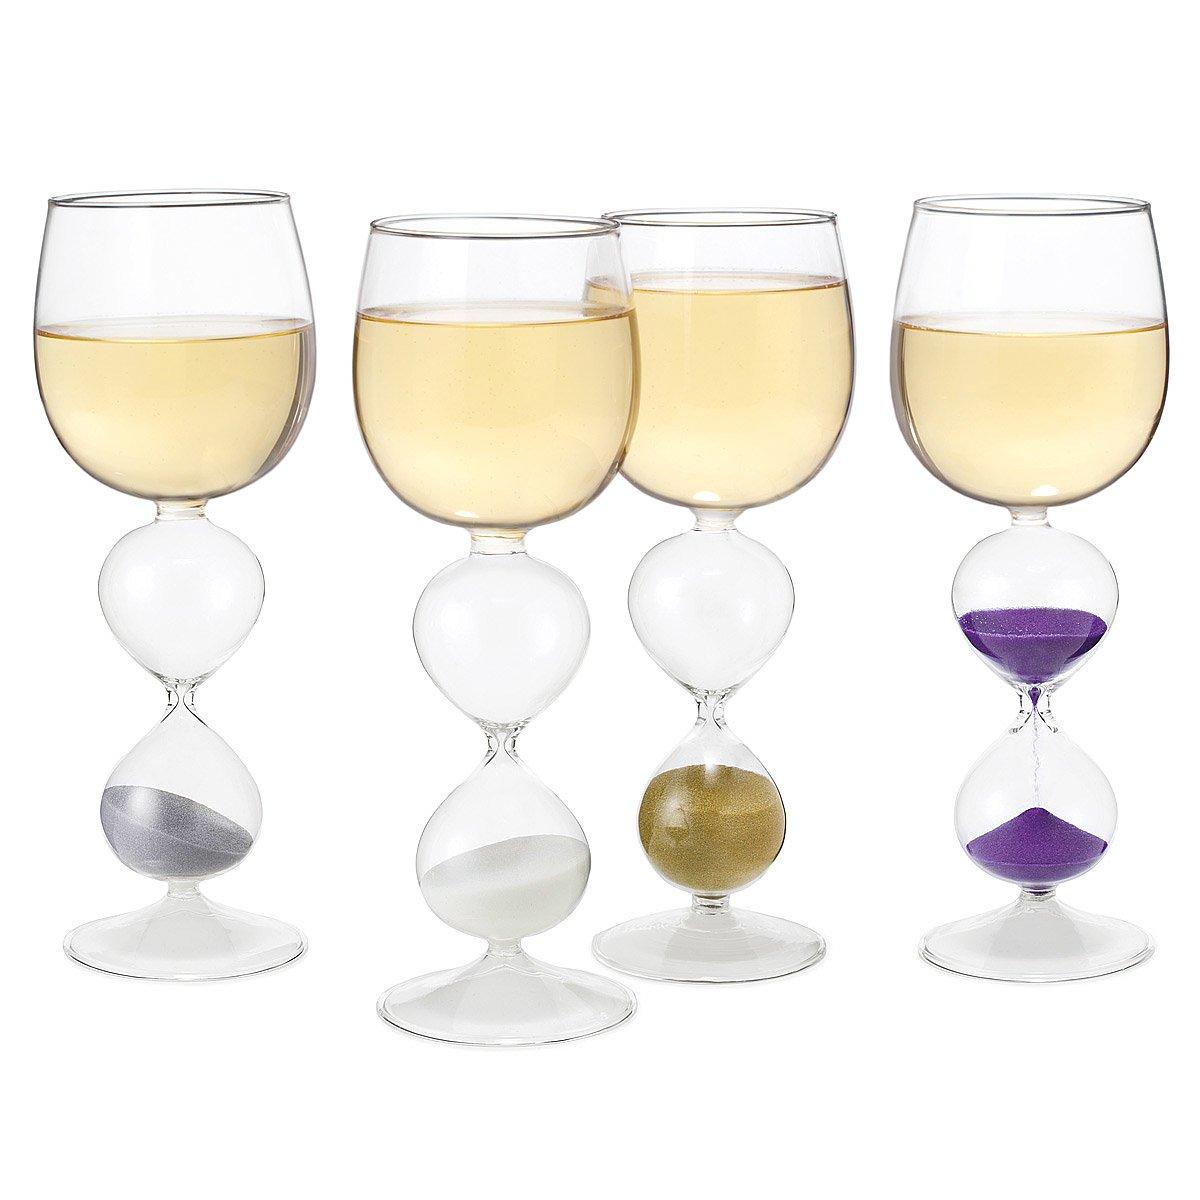 wine hourglasses set of 4 1 thumbnail